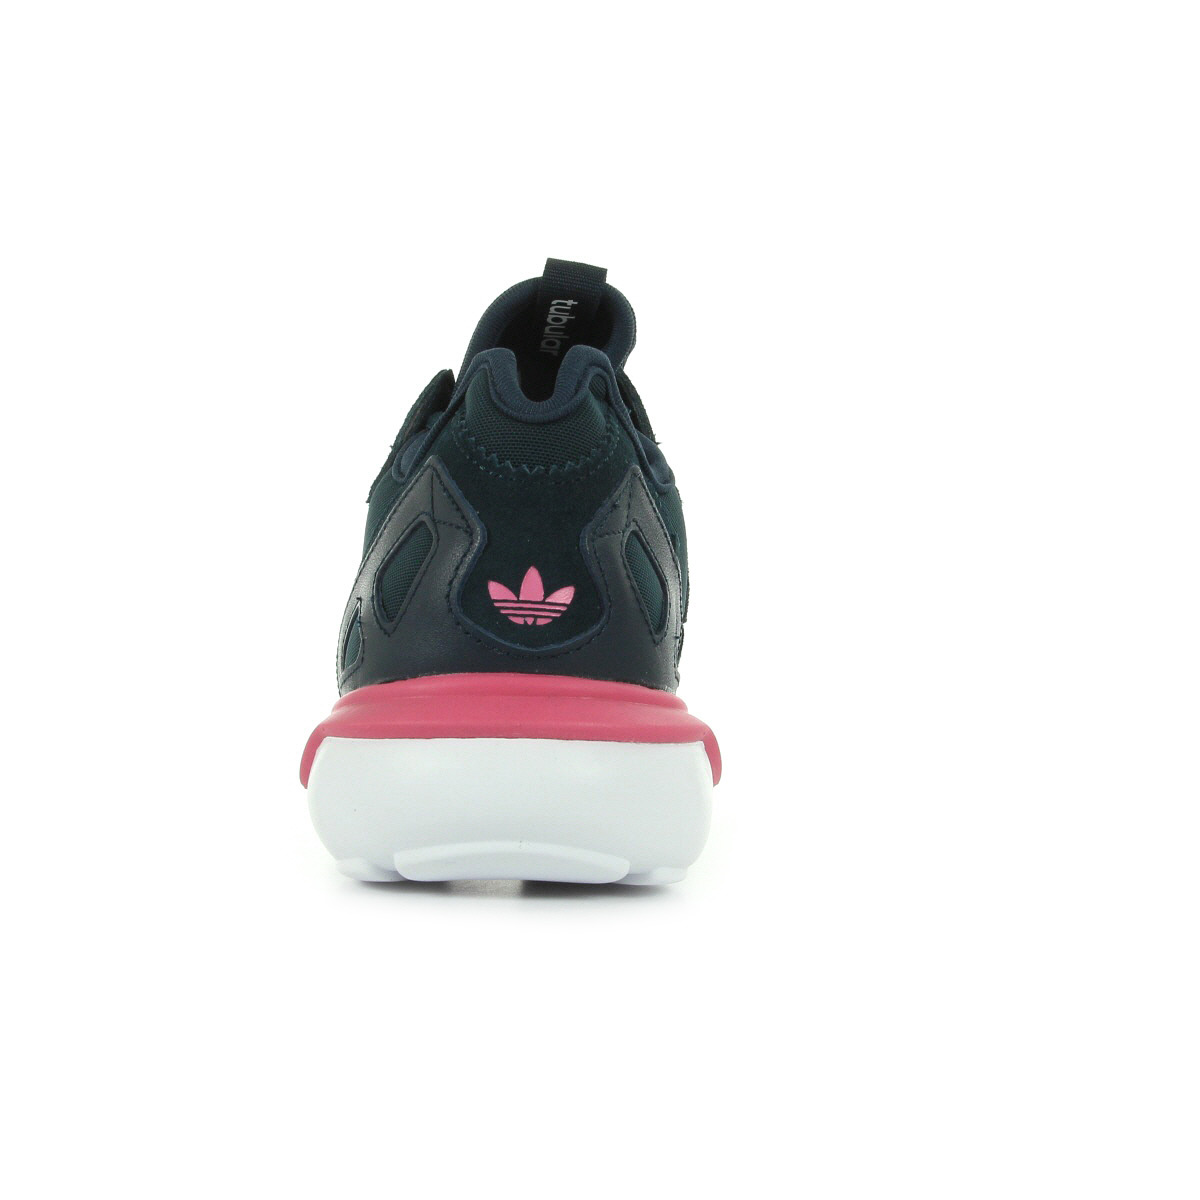 Runner Adidas Mode W B26300Baskets Tubular Femme 4ARL3j5q